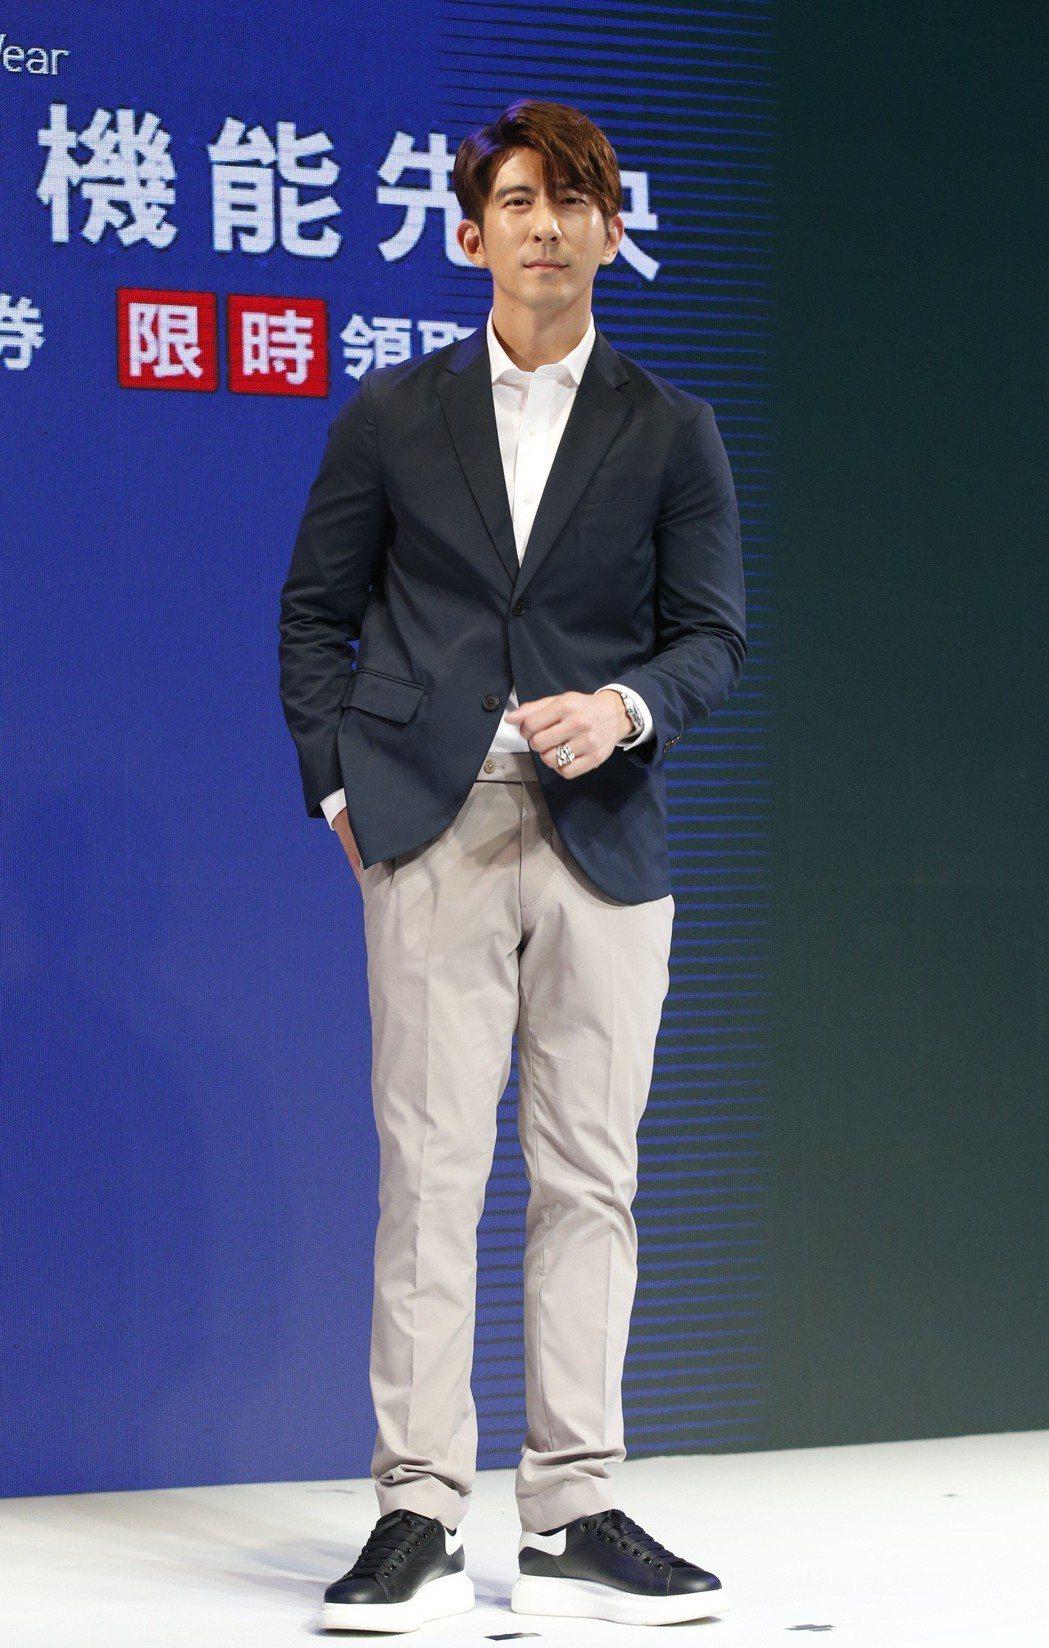 UNIQLO推出「超效男子 機能優先」男裝系列,邀請超效代表「男神暖爸」修杰楷代...